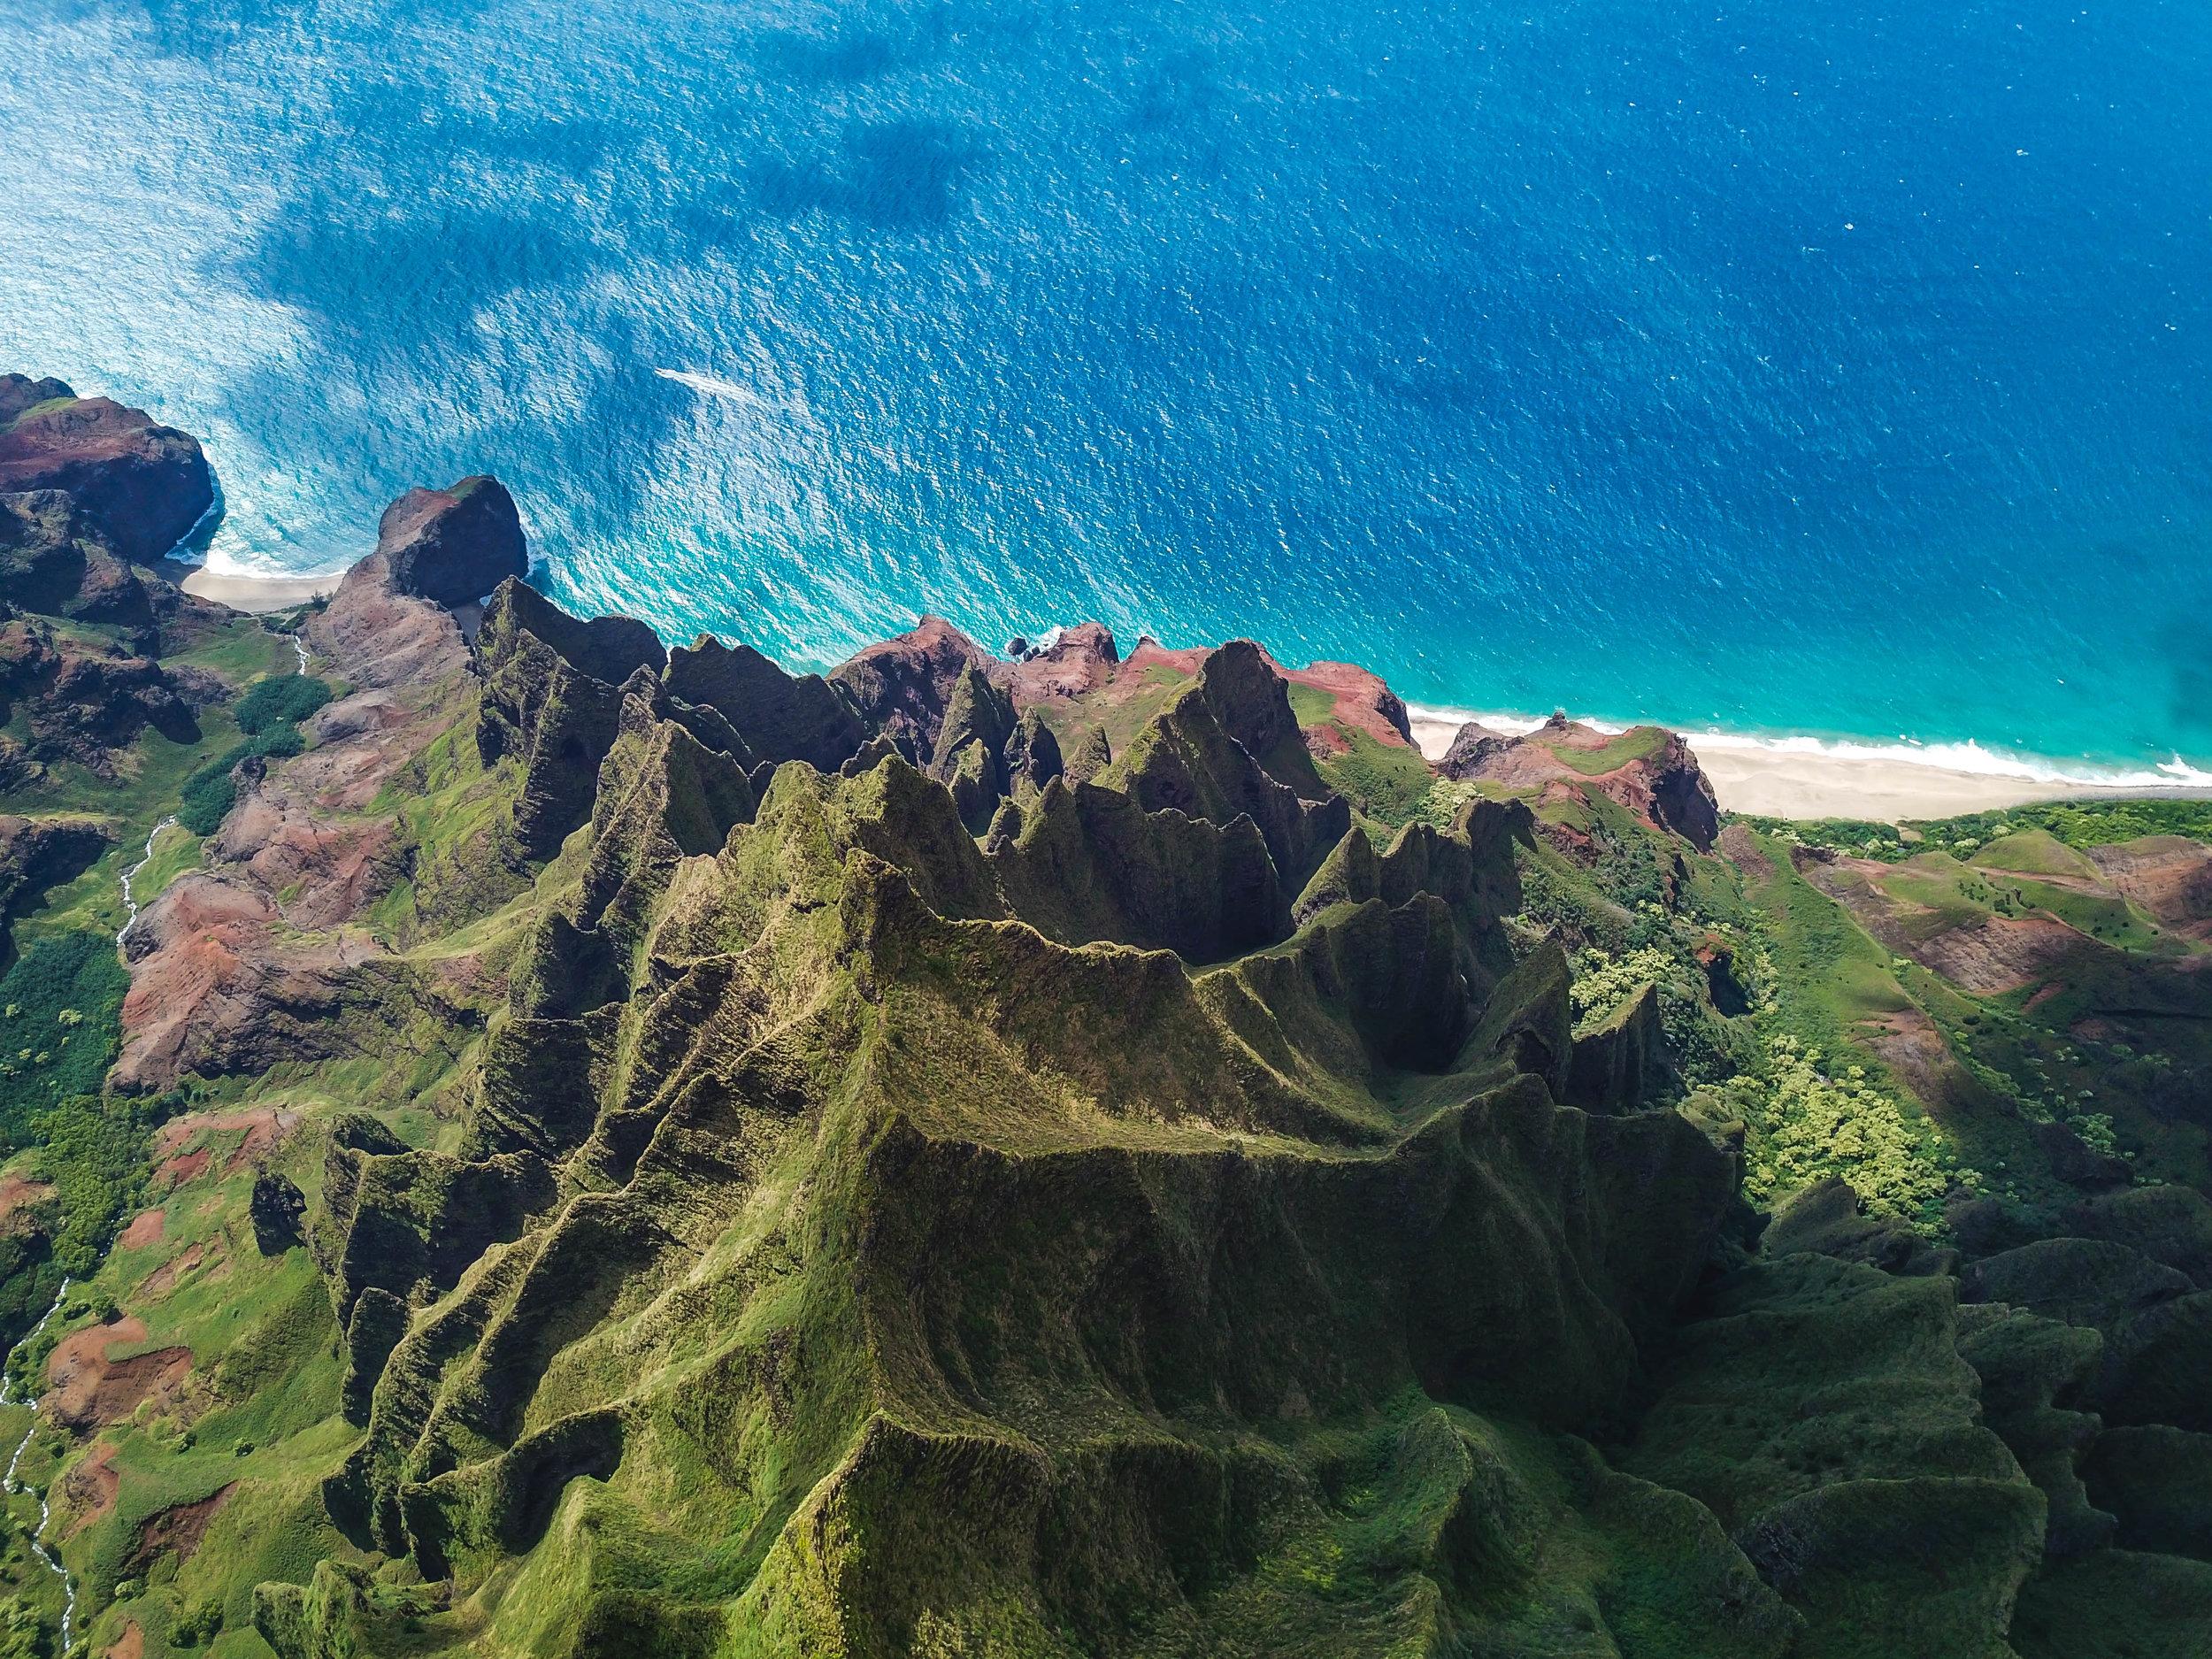 dji drone kauai hawaii photo